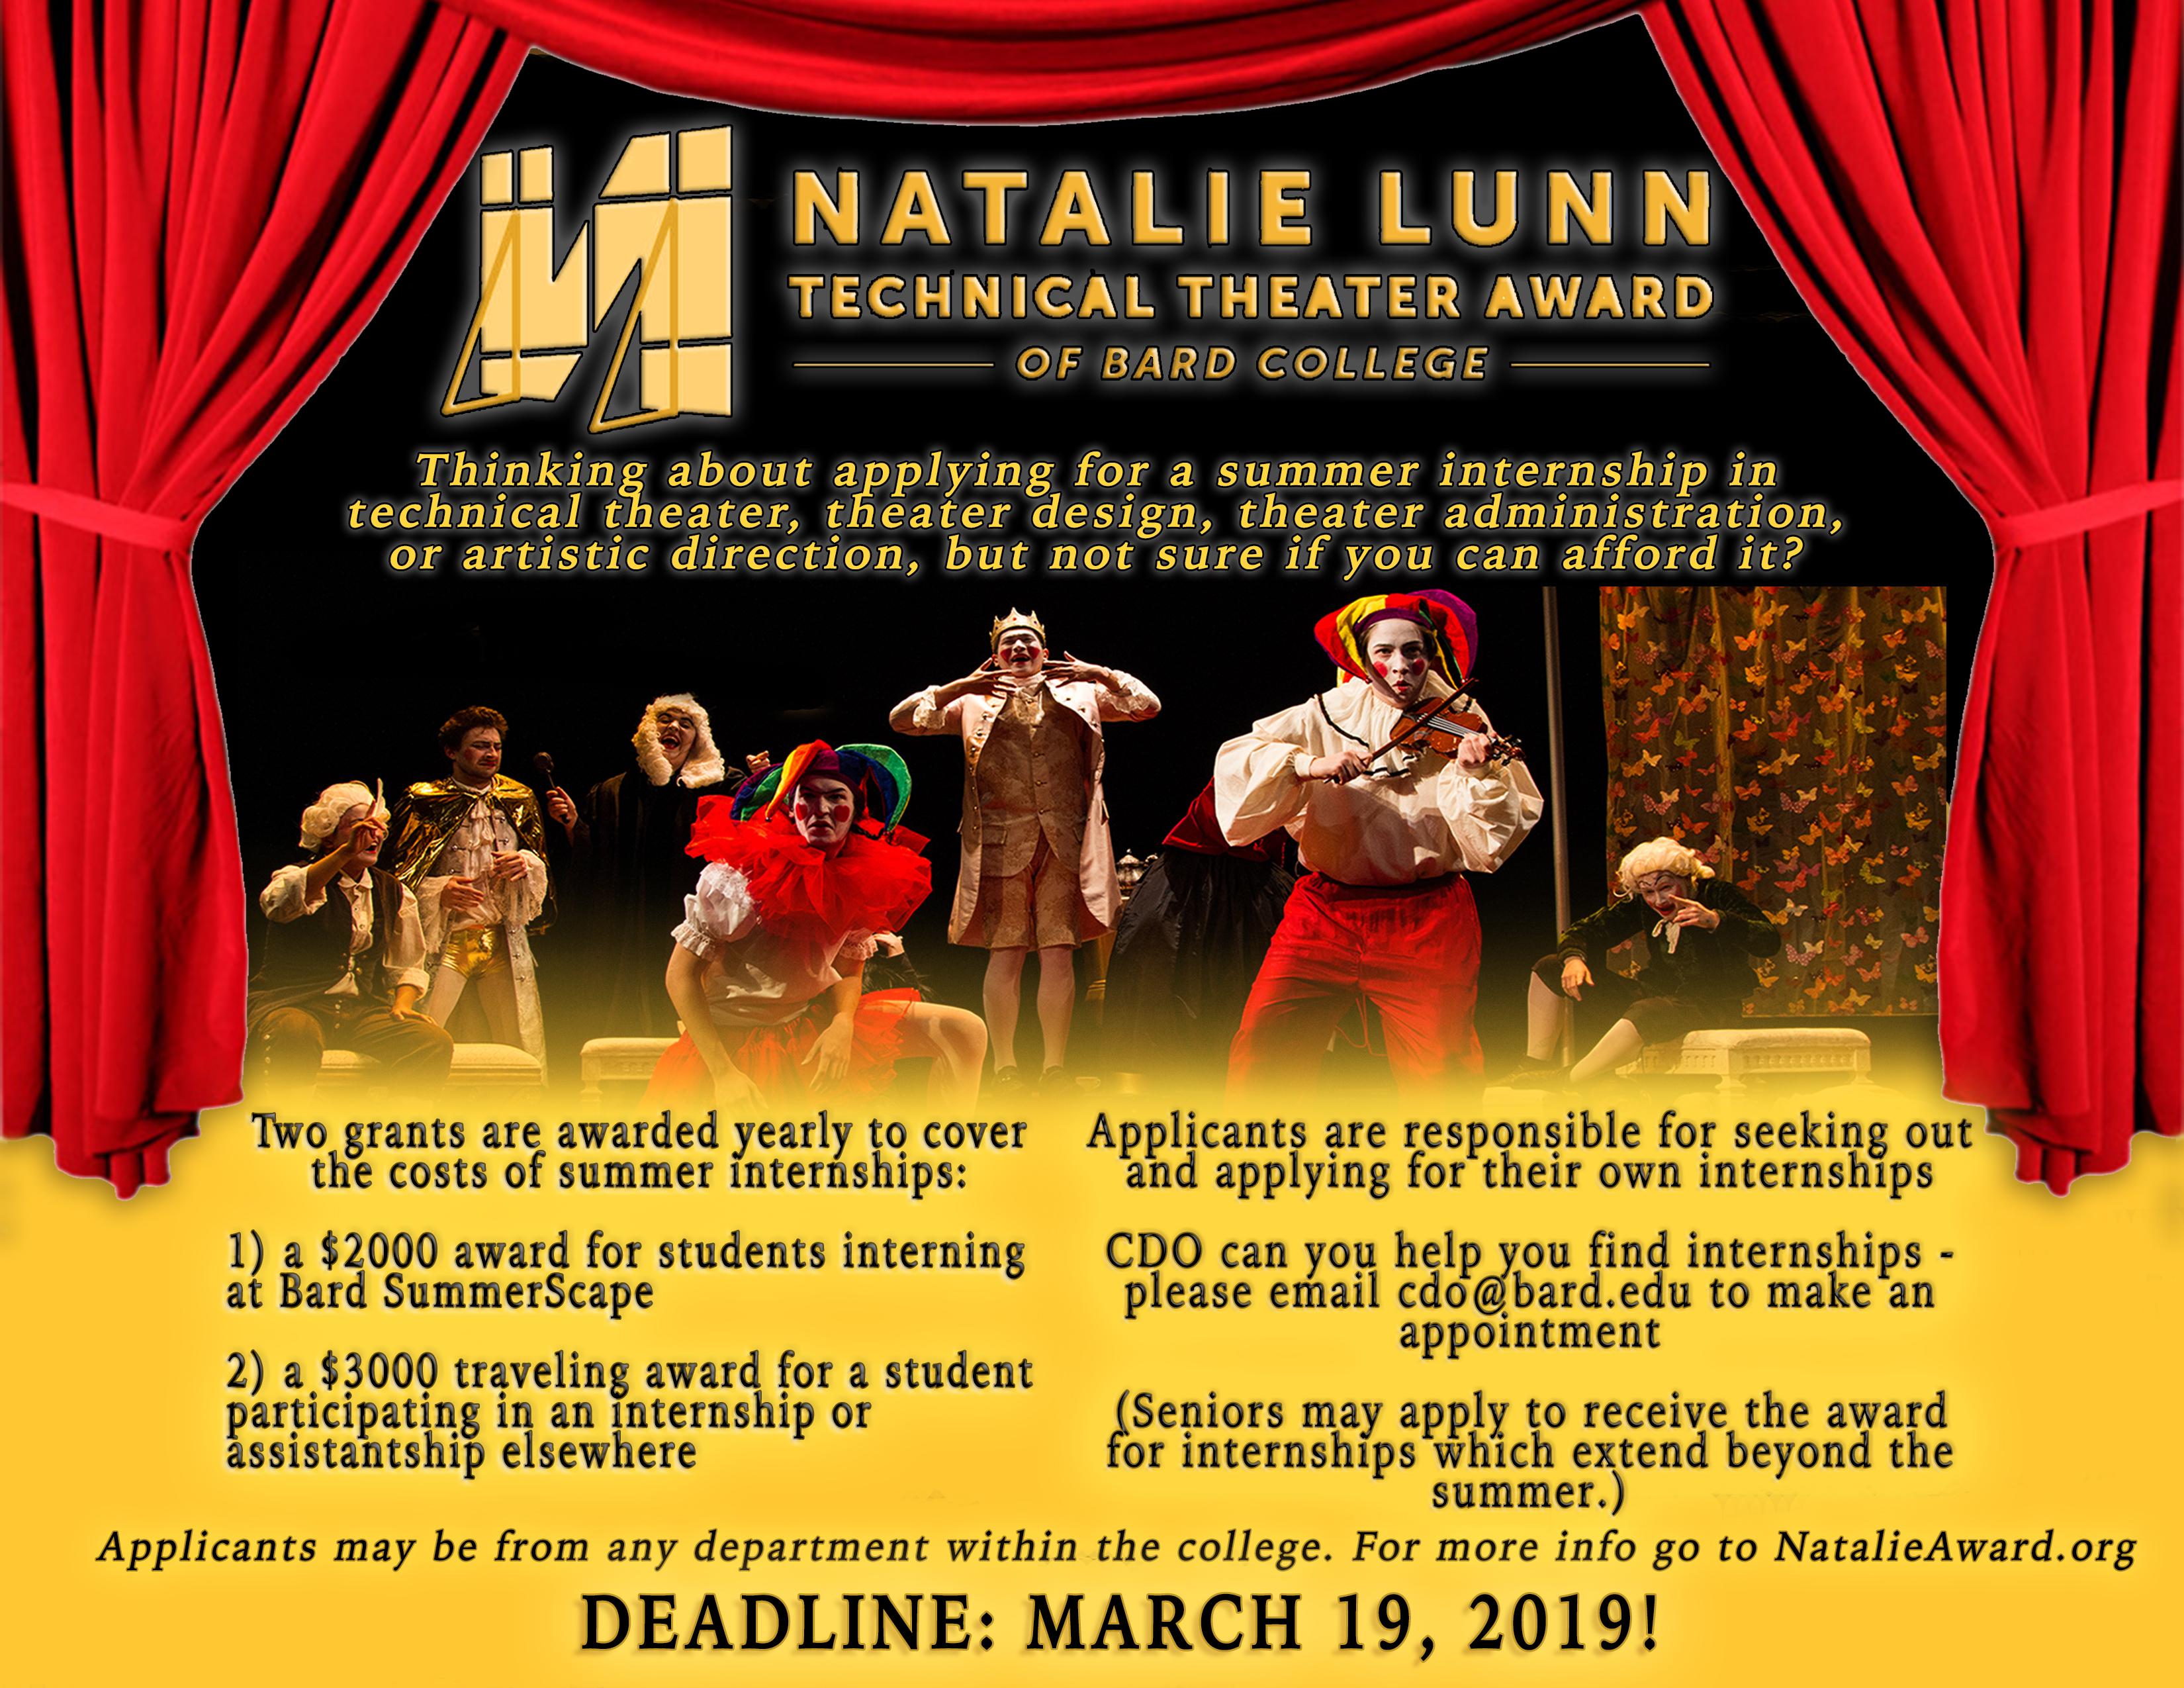 [Deadline: Natalie Lunn Teachnical Theater Awards]